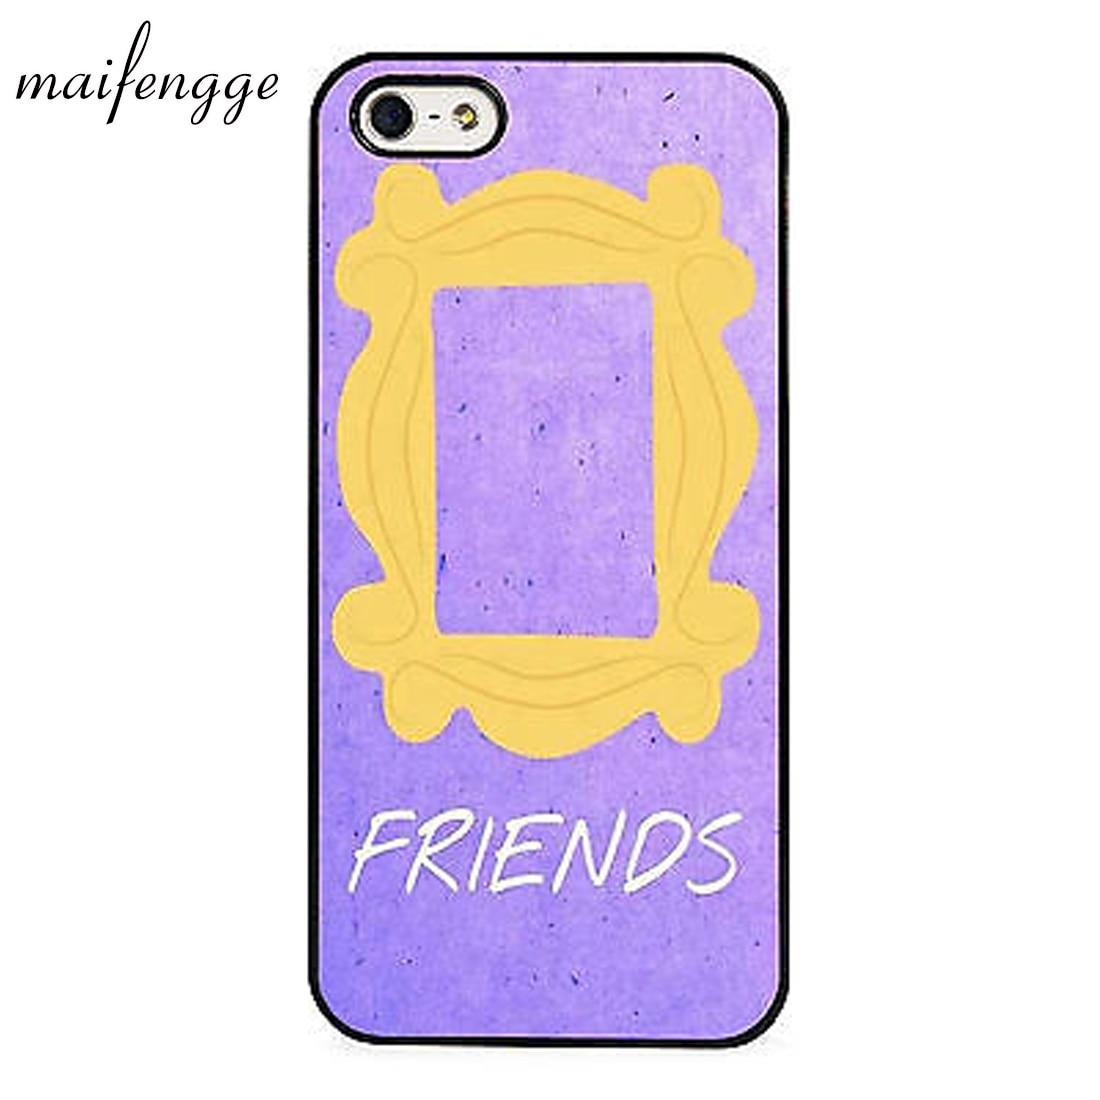 Maifengge Monicas puerta púrpura amigos NYC caso para iPhone 5 5 5 6 6 7 8 plus 11 pro X XR XS Max Samsung Galaxy S7edge S8 S9 S8